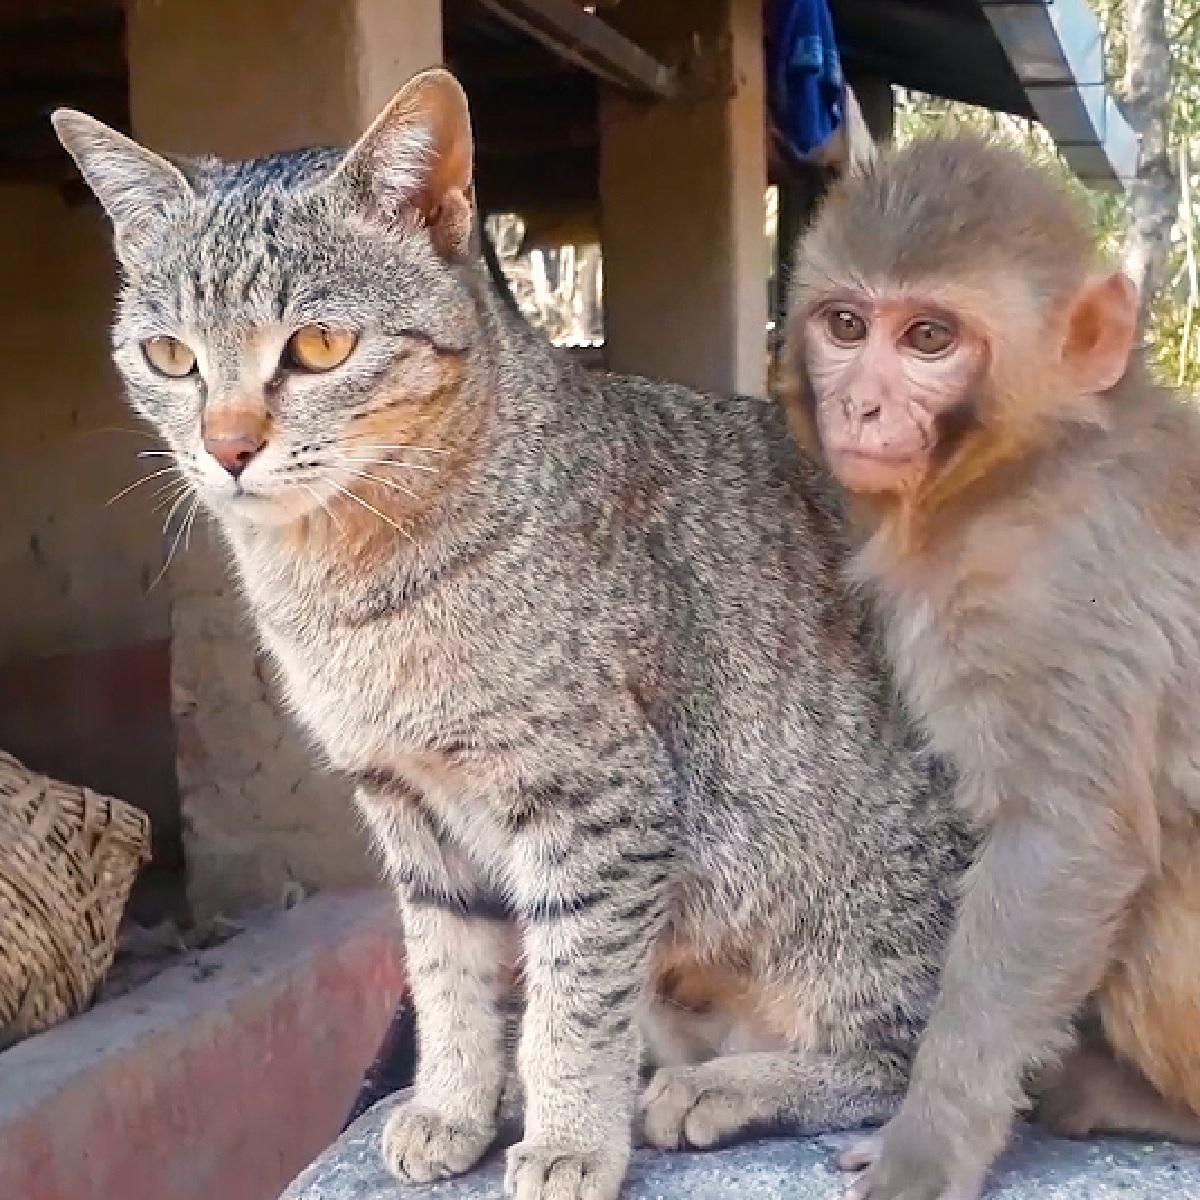 scimmietta gattina amica stretta